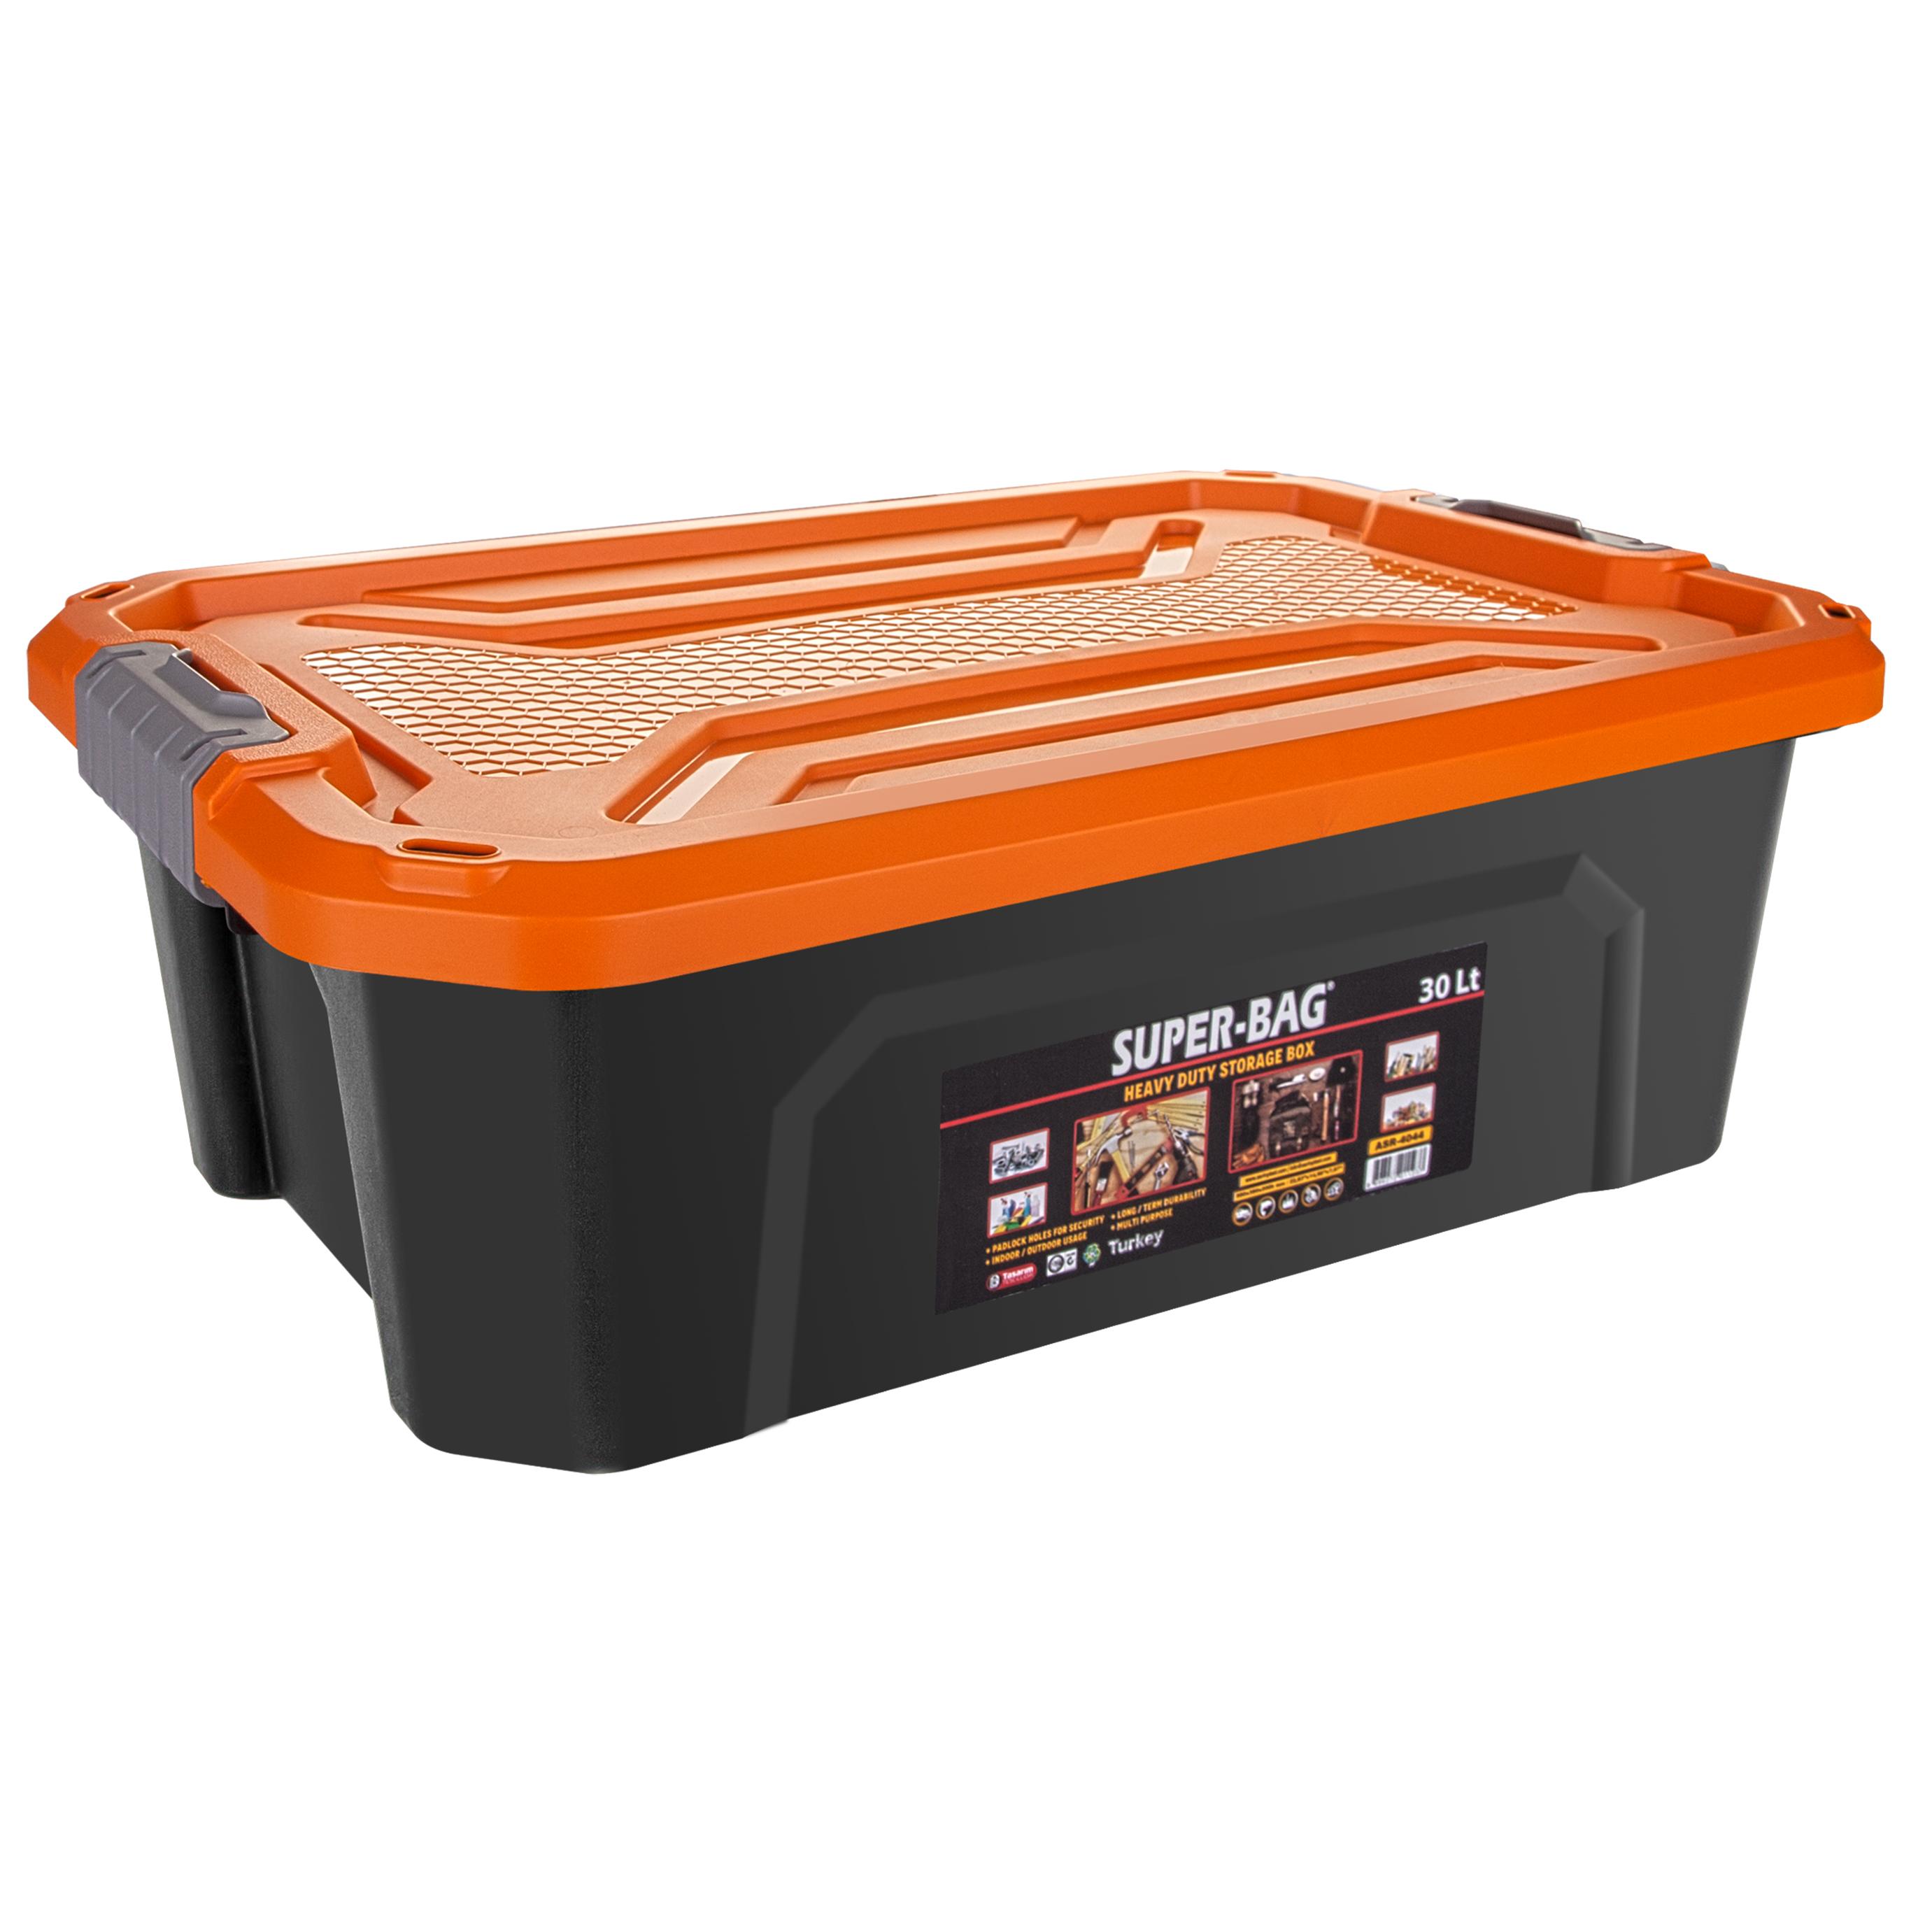 ASR-4044 Superbag Saklama Kutusu Renkli Kapak 30 LT